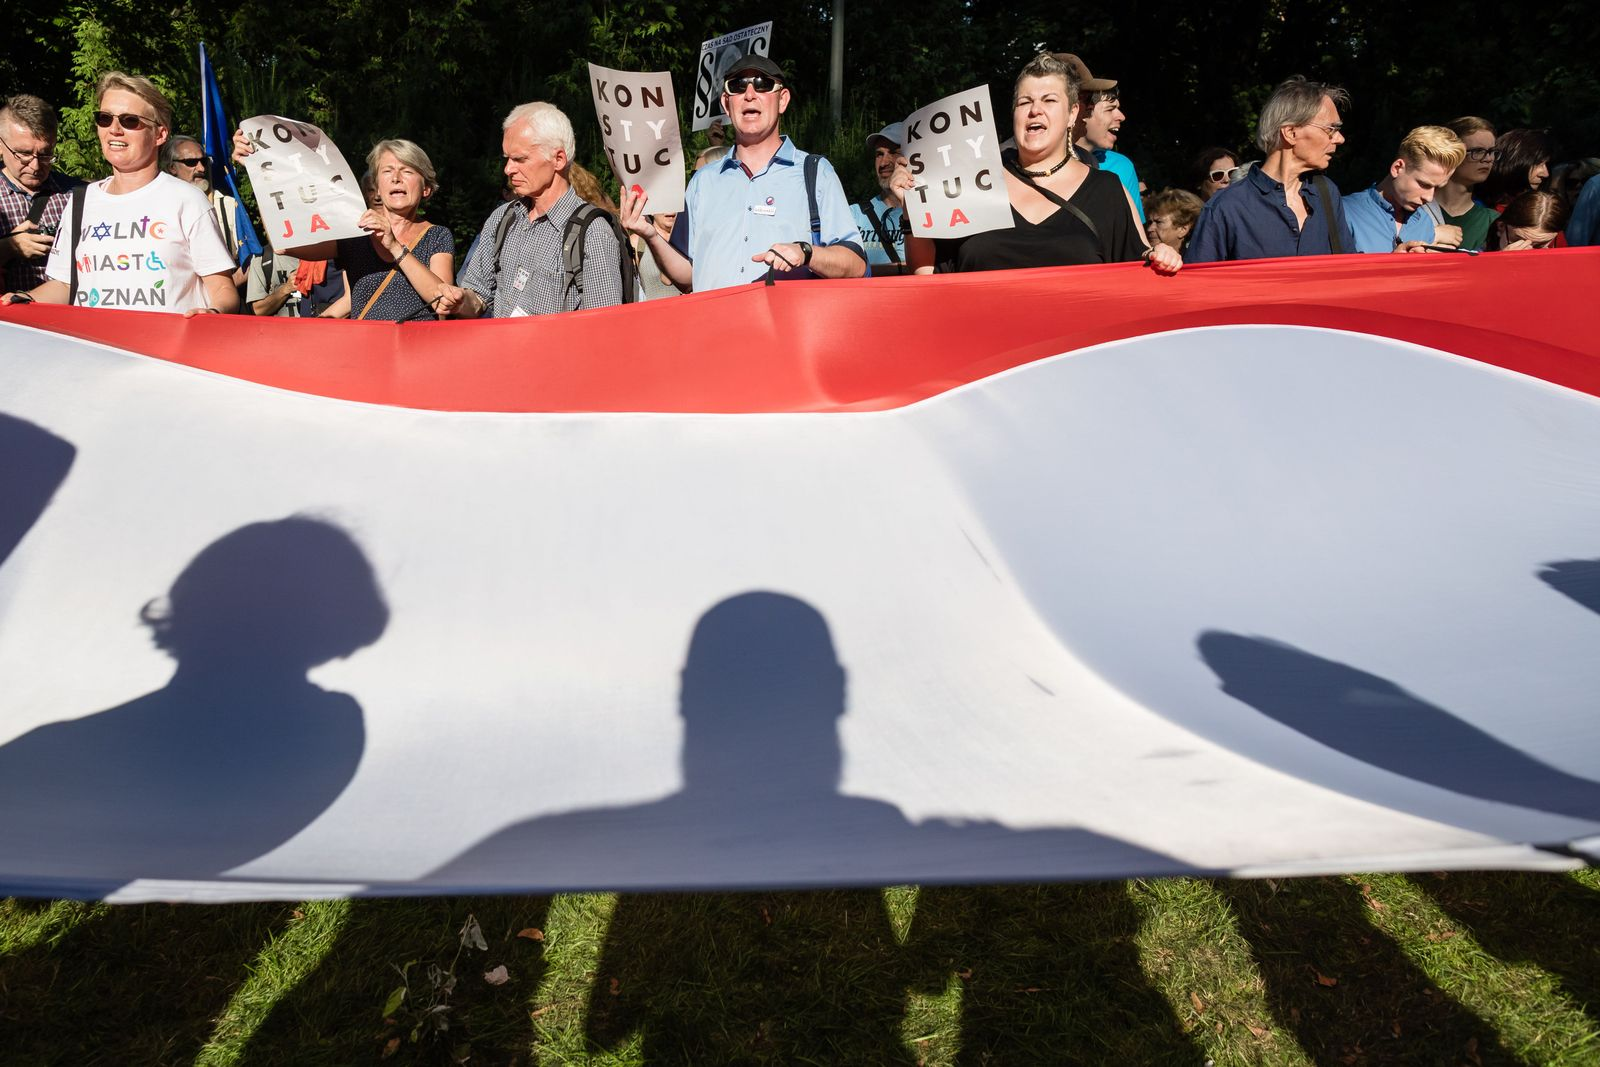 Polen/ Justizreform/ Protest